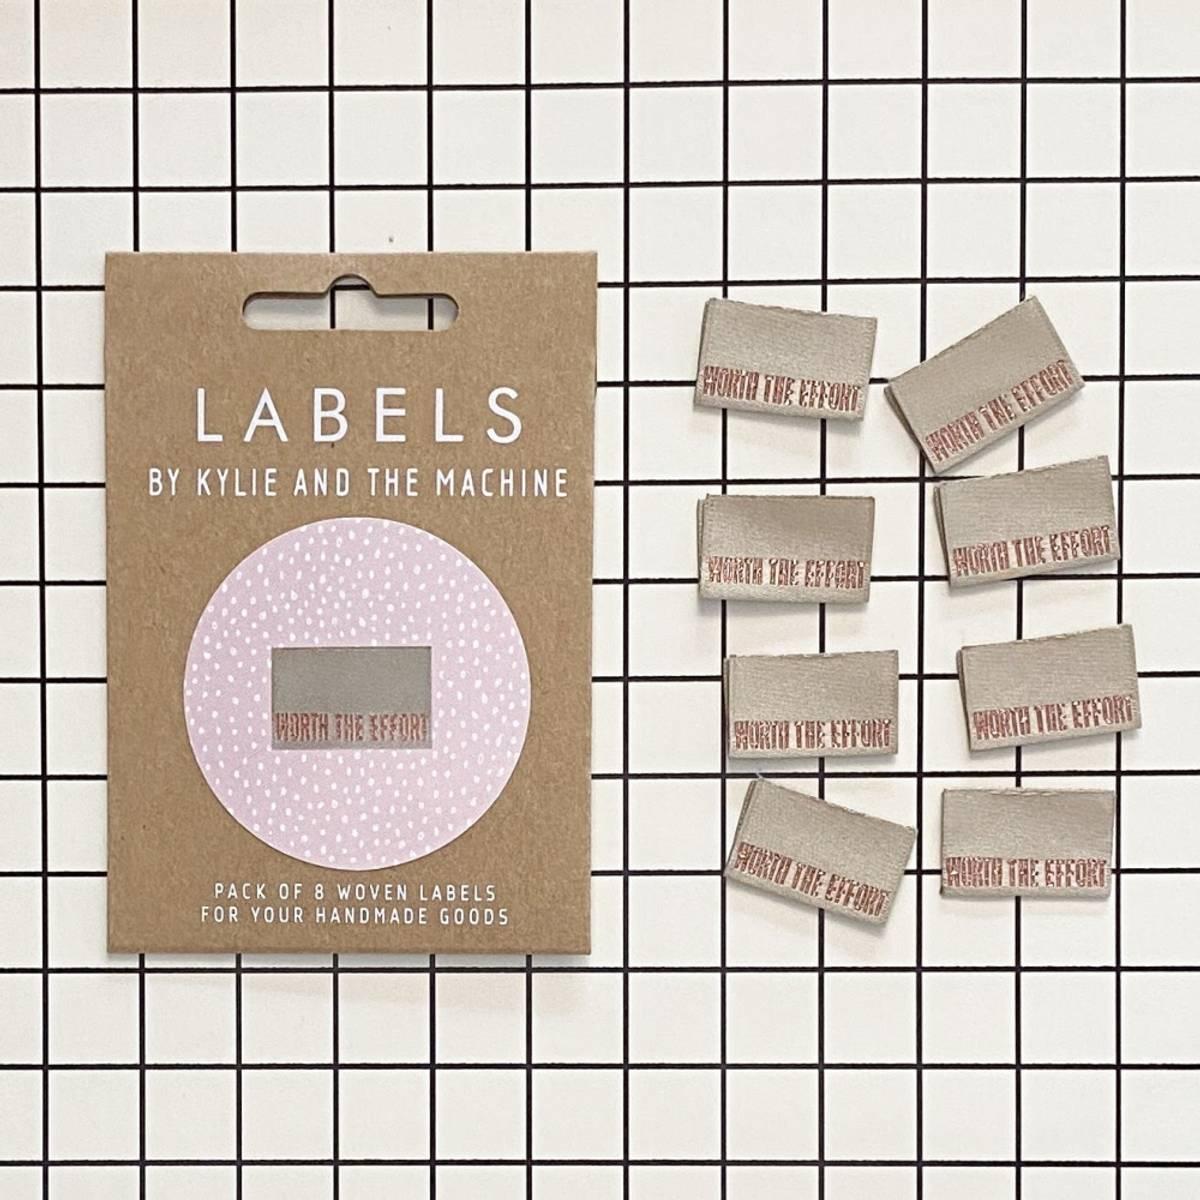 Labels - Worth the effort